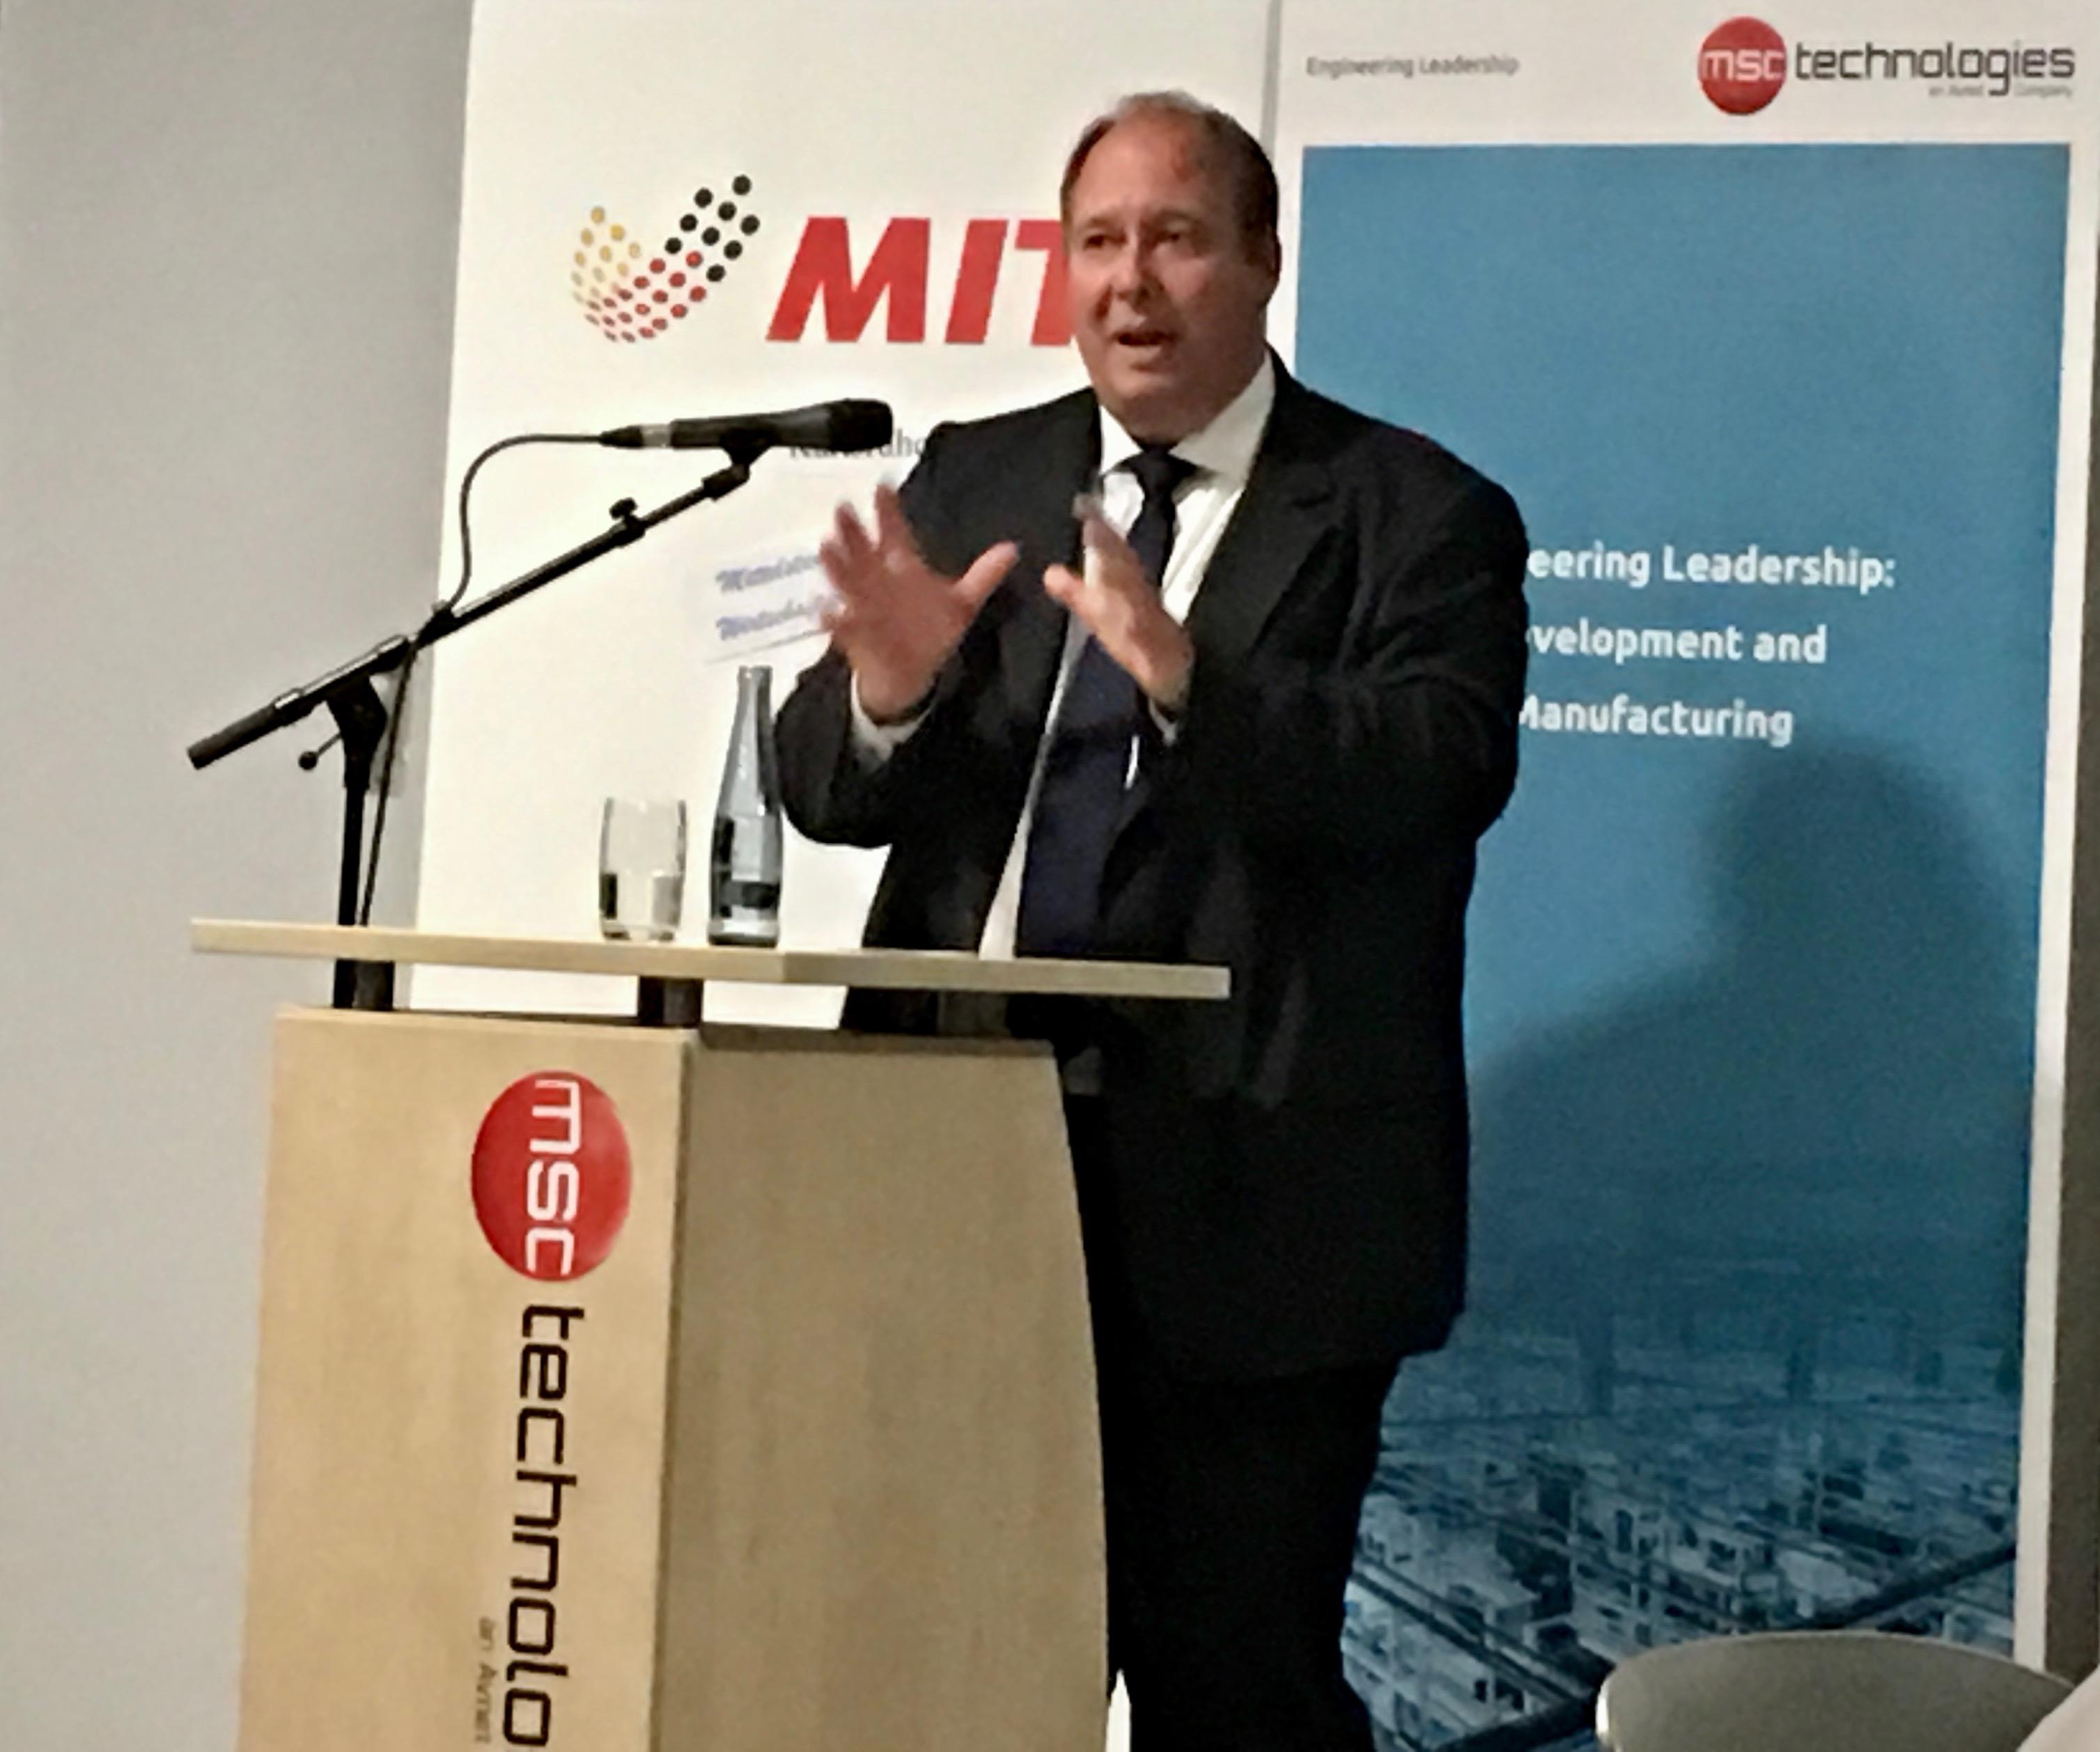 Kanzleramtsministerminister Helge Braun